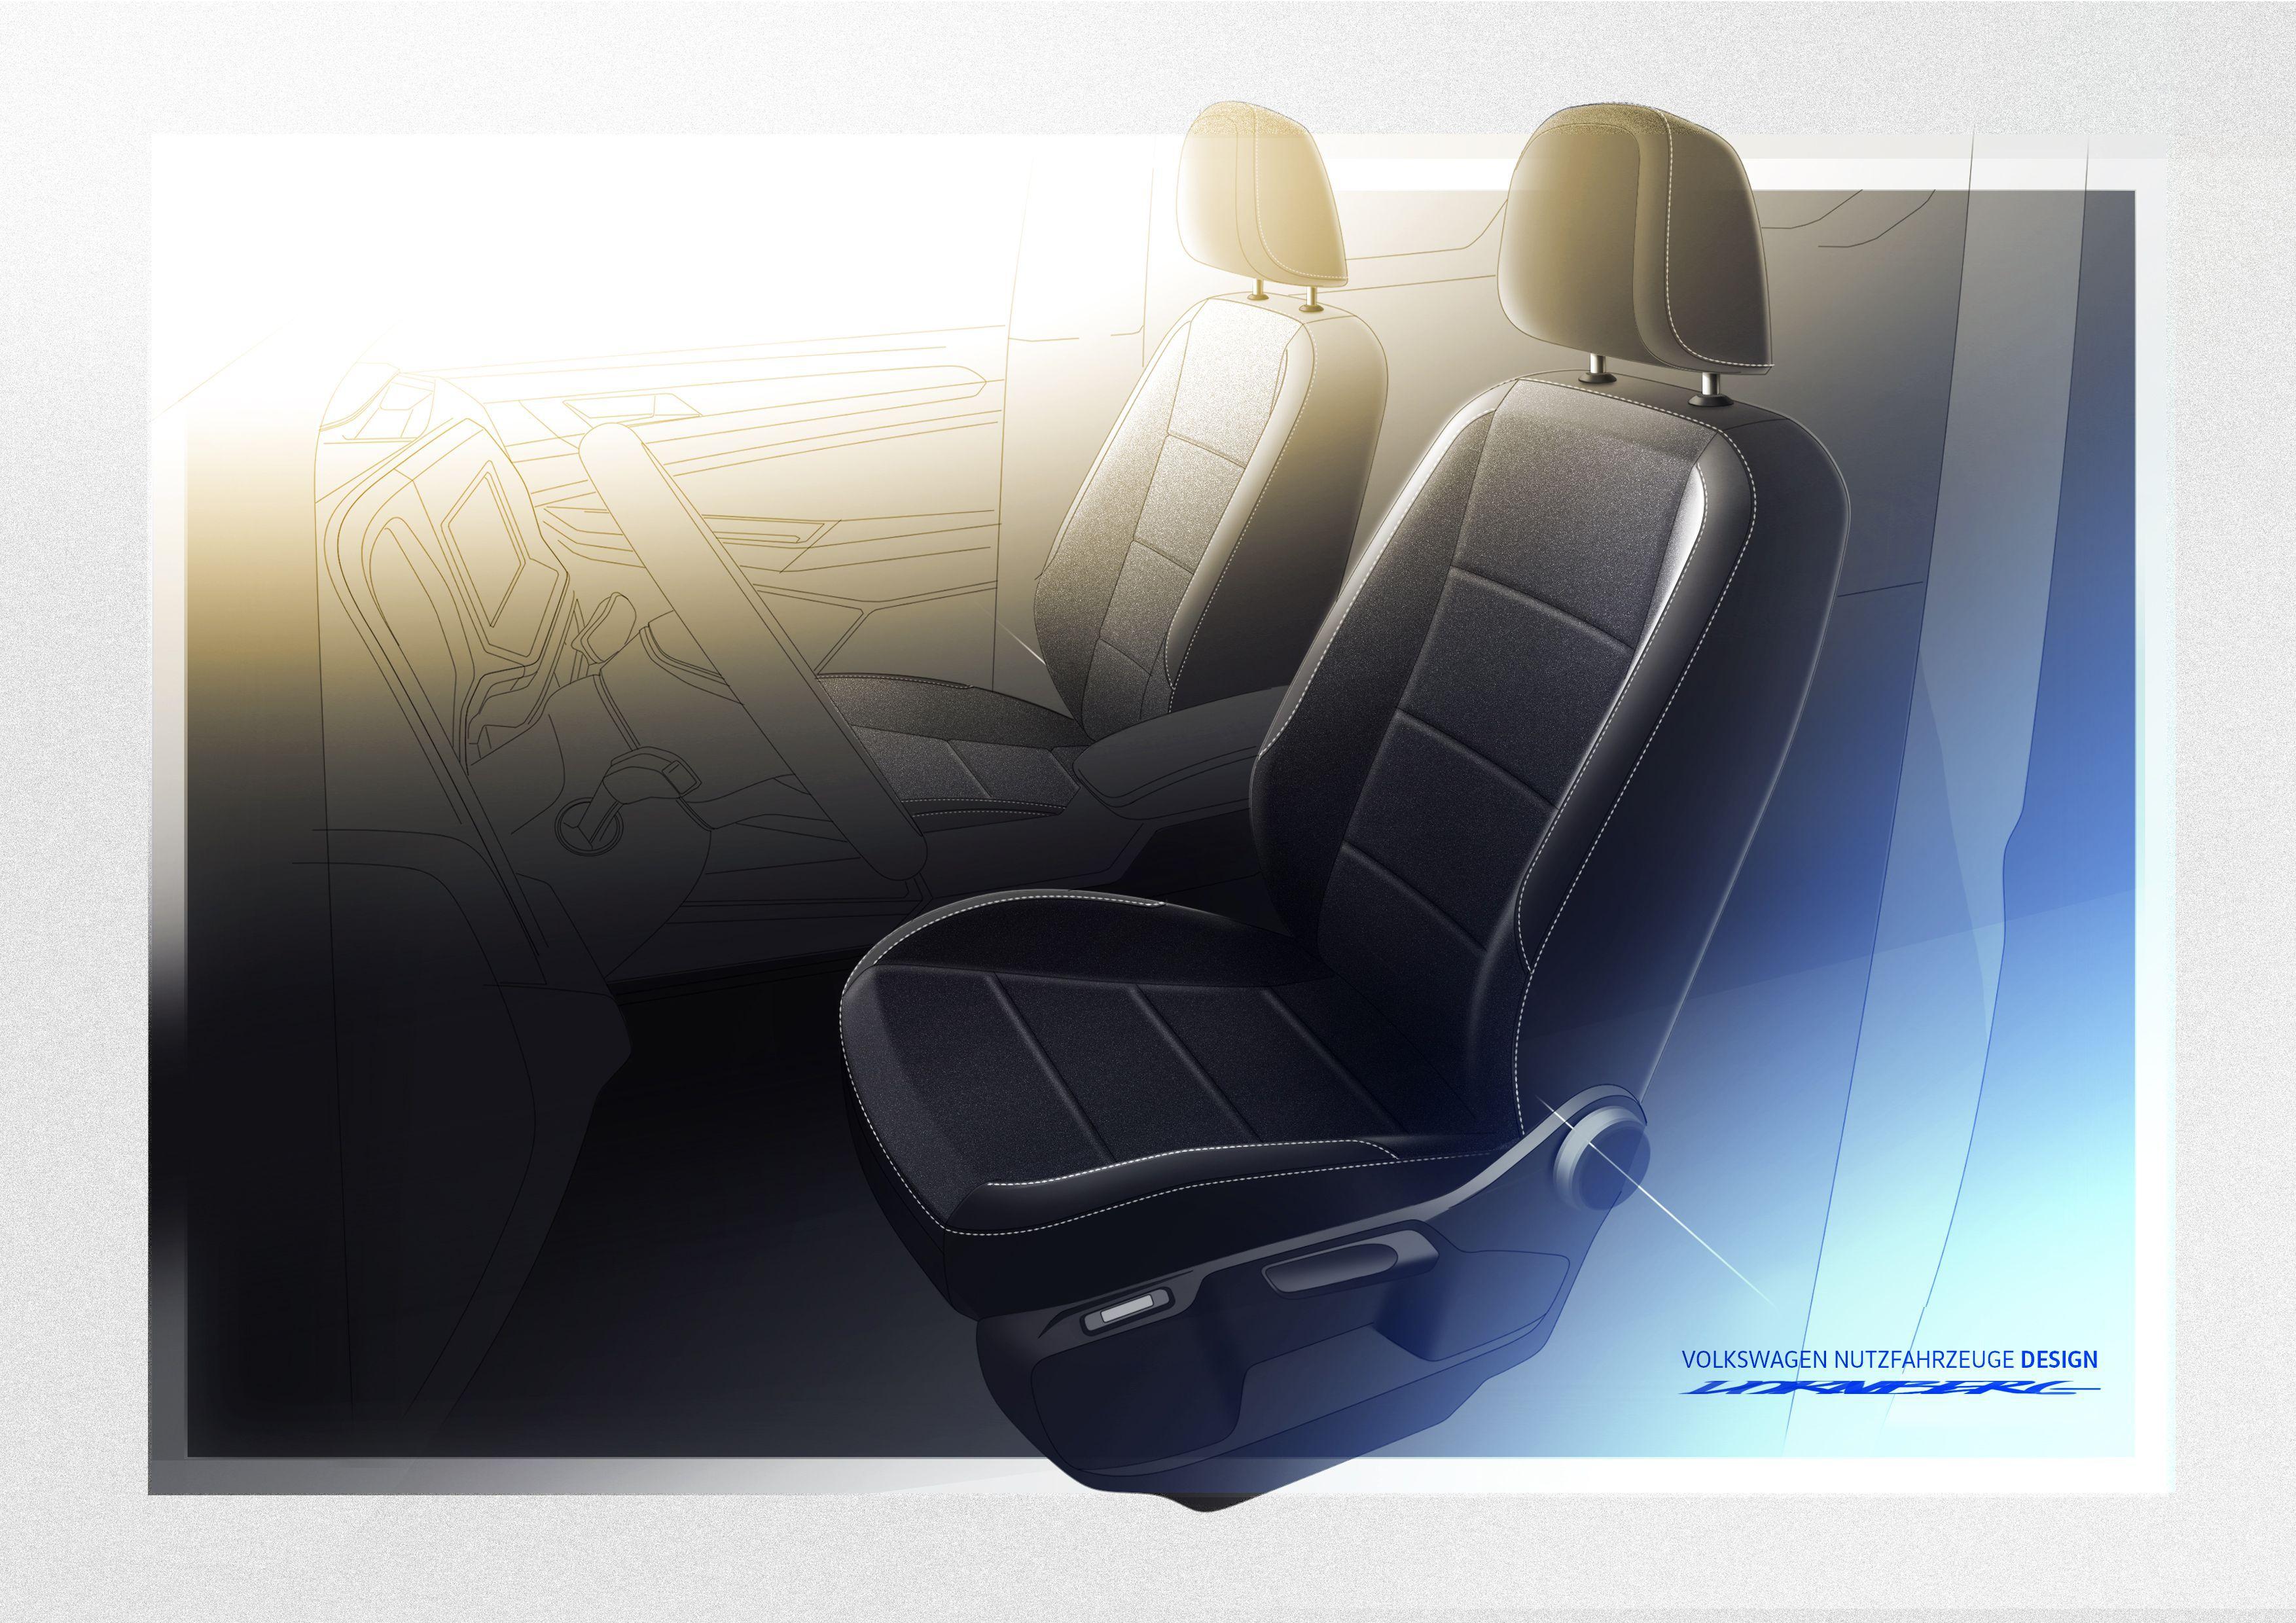 Interior of VW Caddy